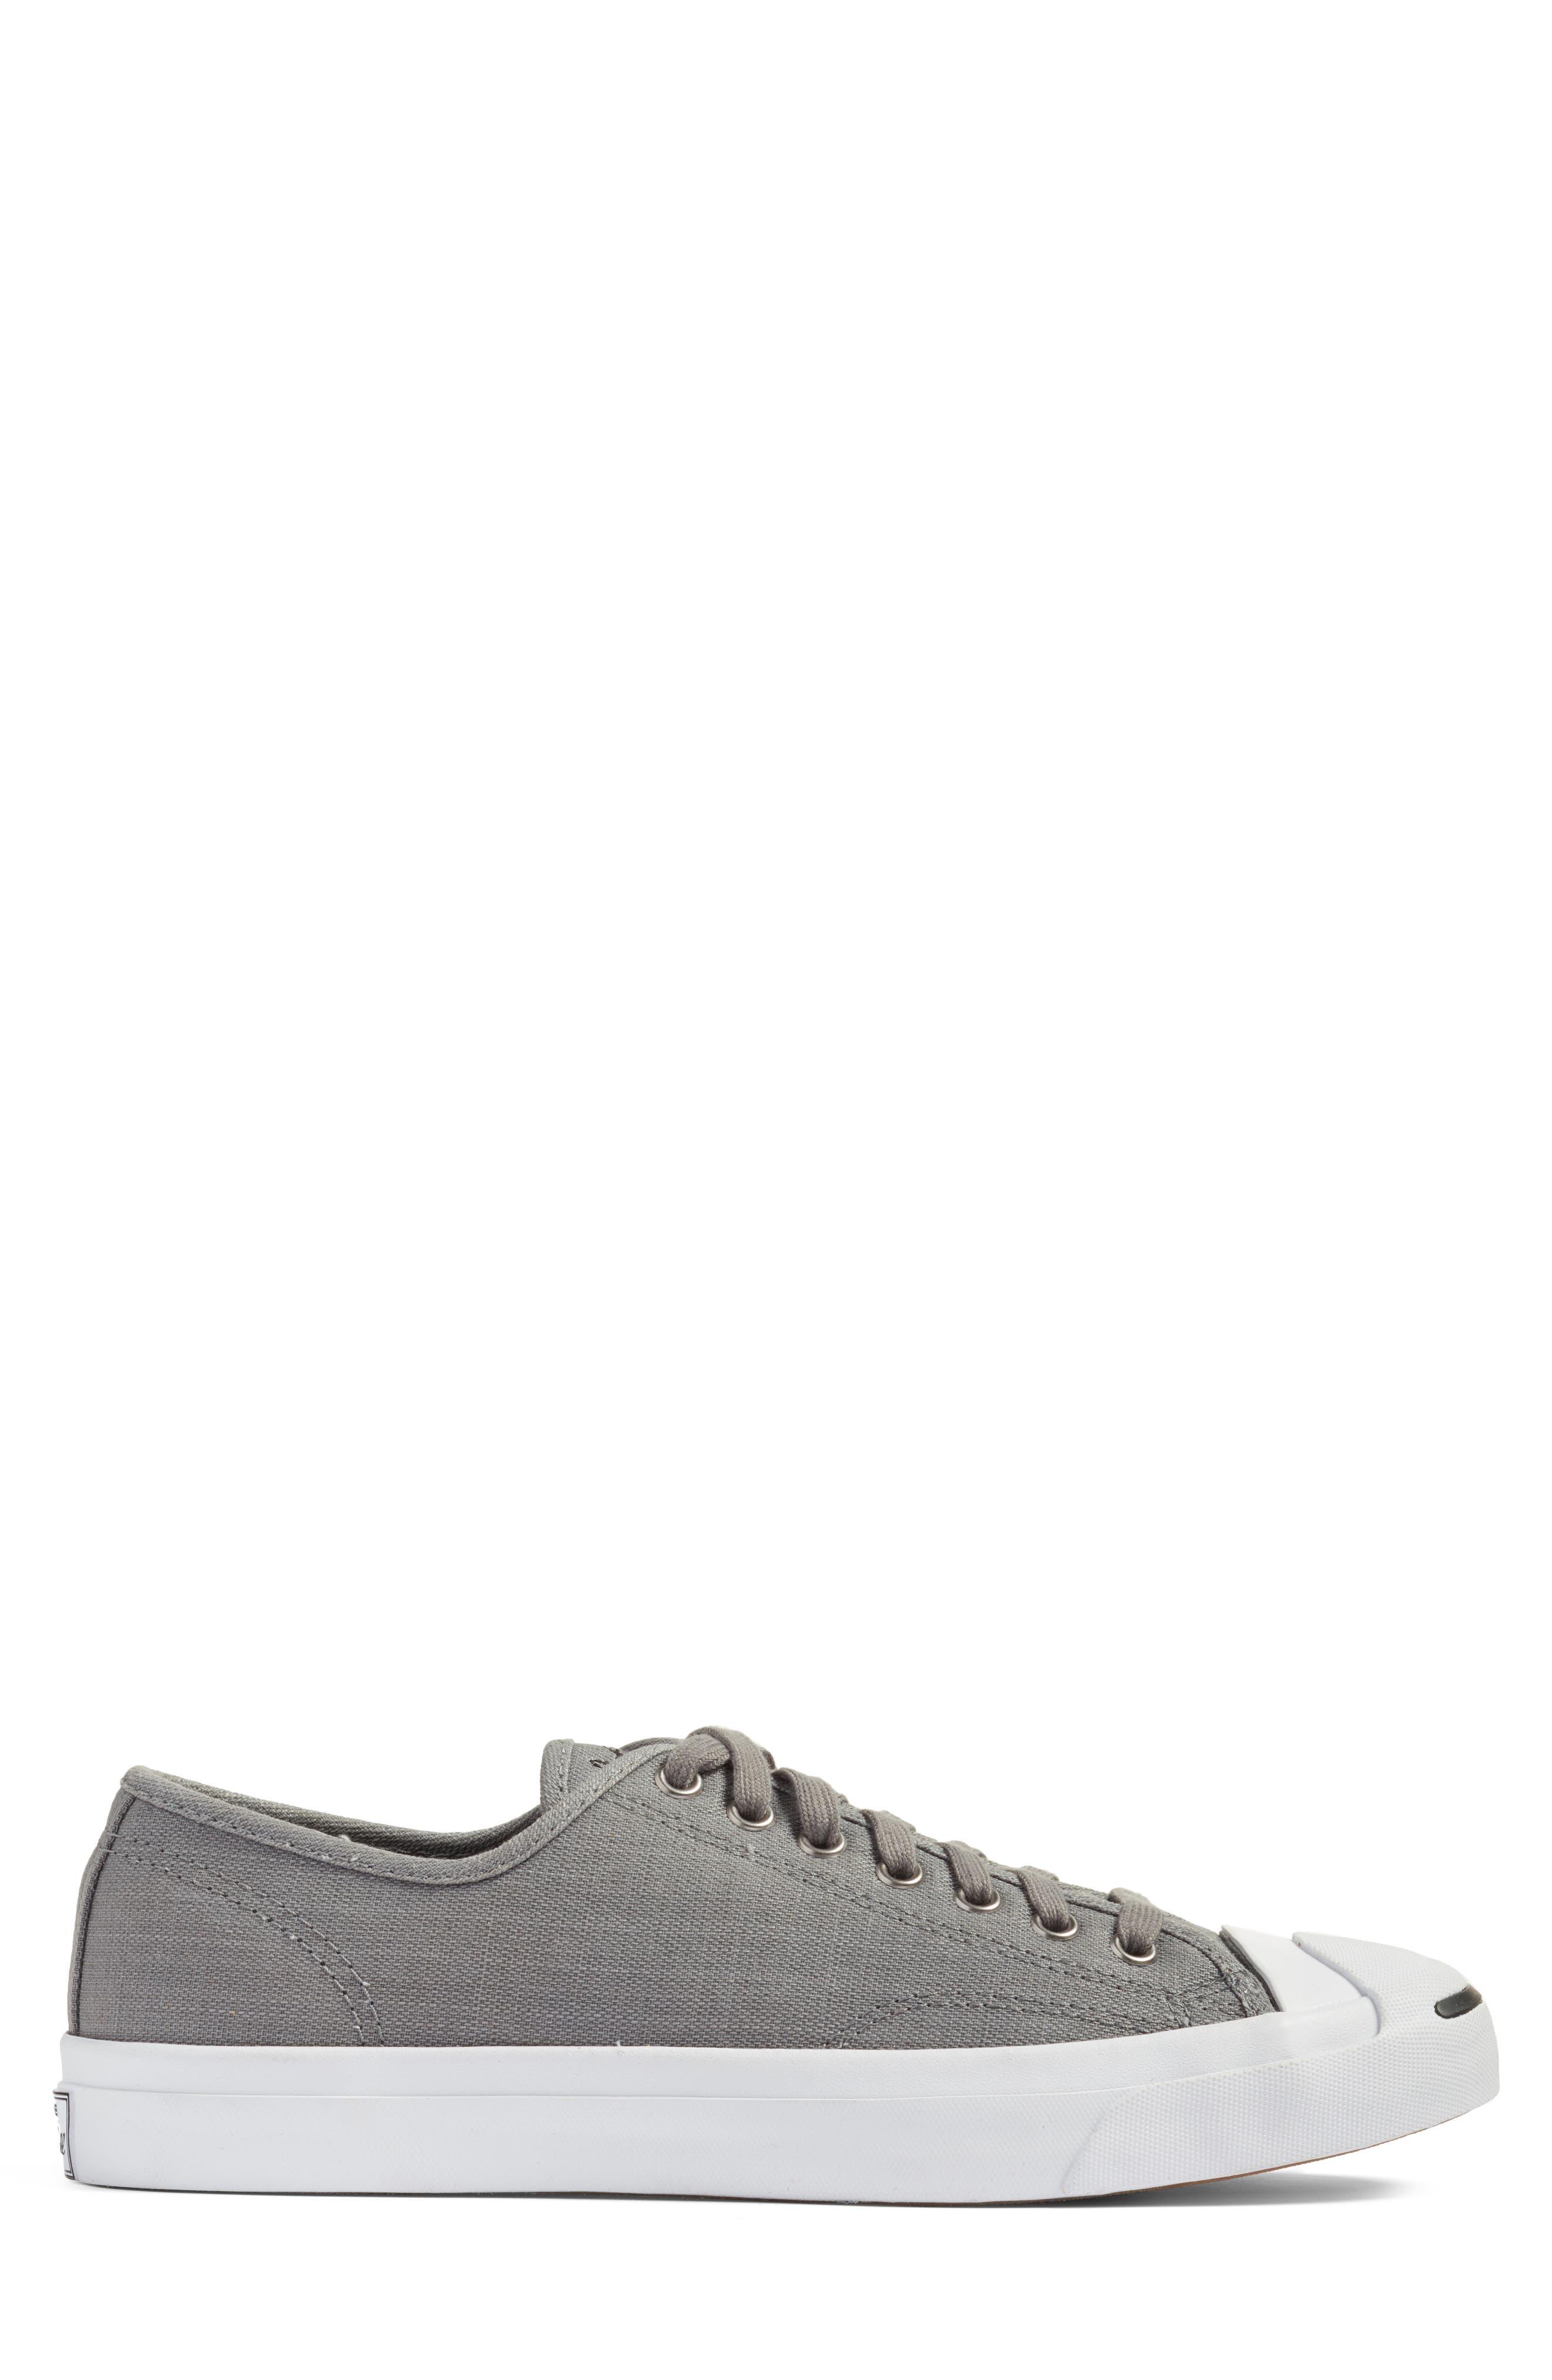 Alternate Image 3  - Converse Jack Purcell Ox Sneaker (Men)